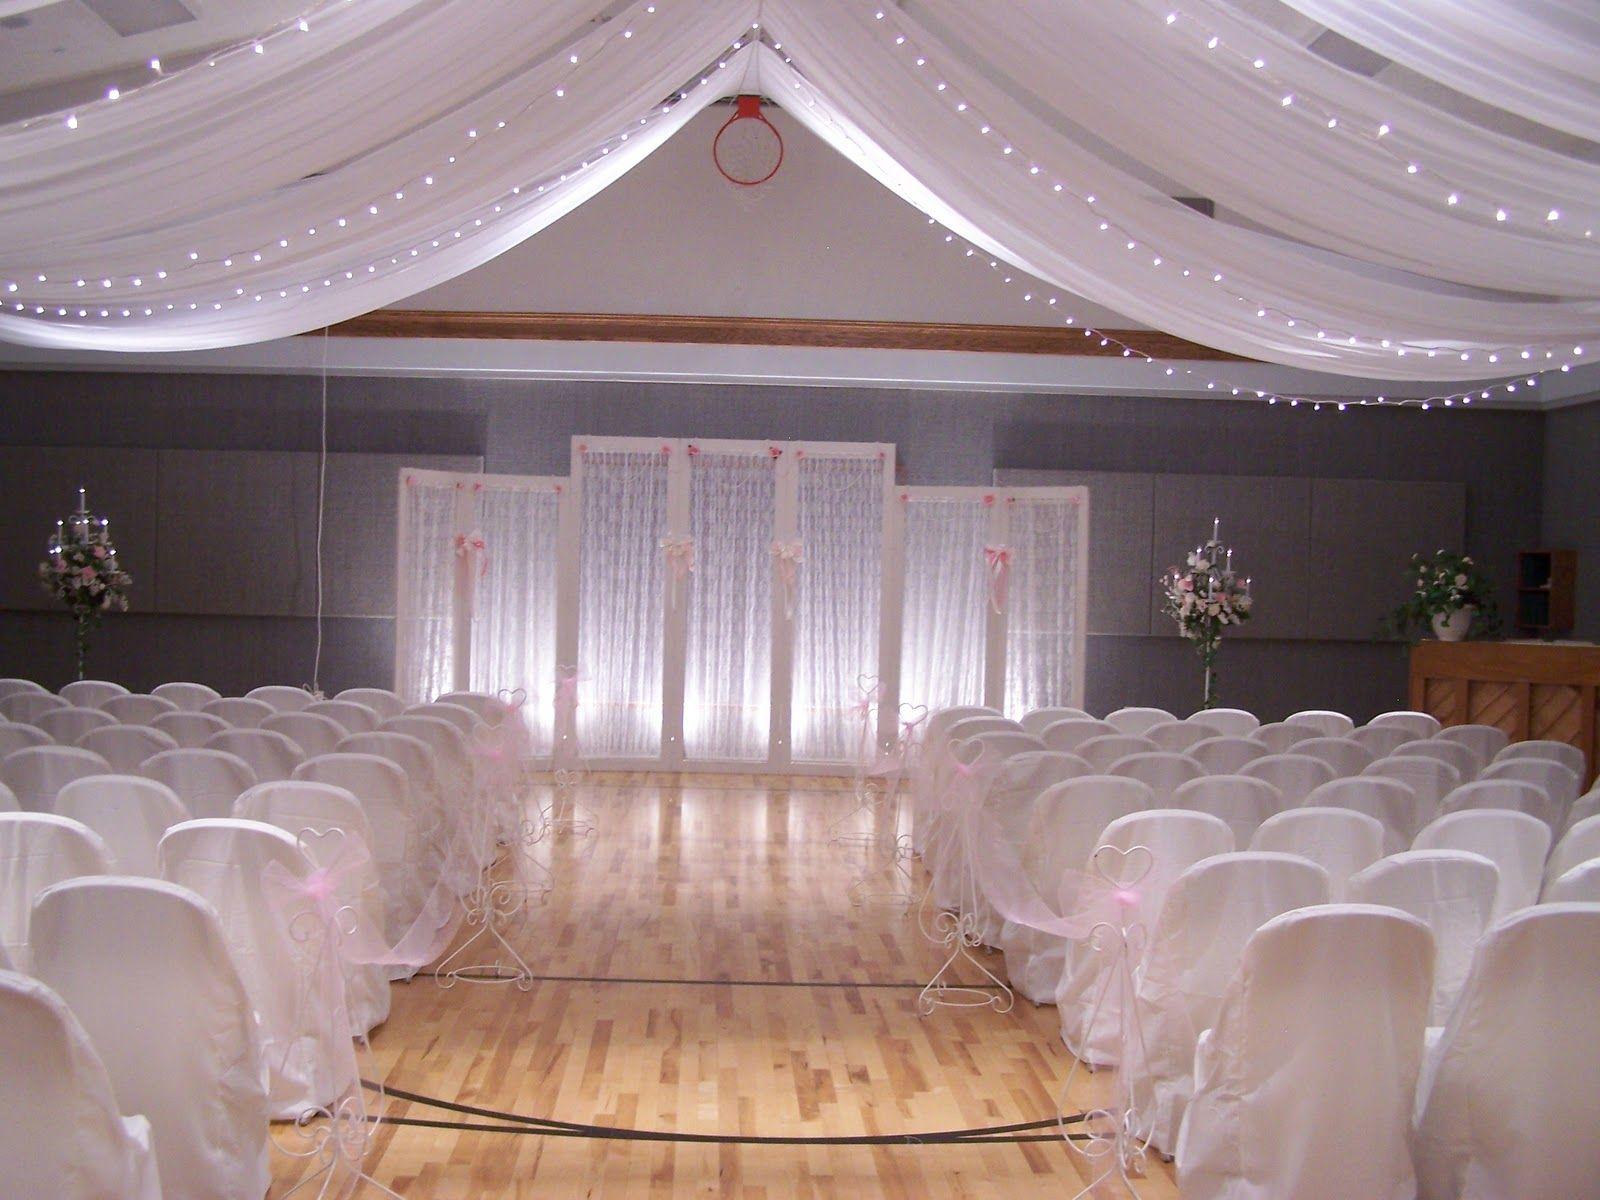 100_3820.JPG 1,600×1,200 pixels Cheap wedding reception